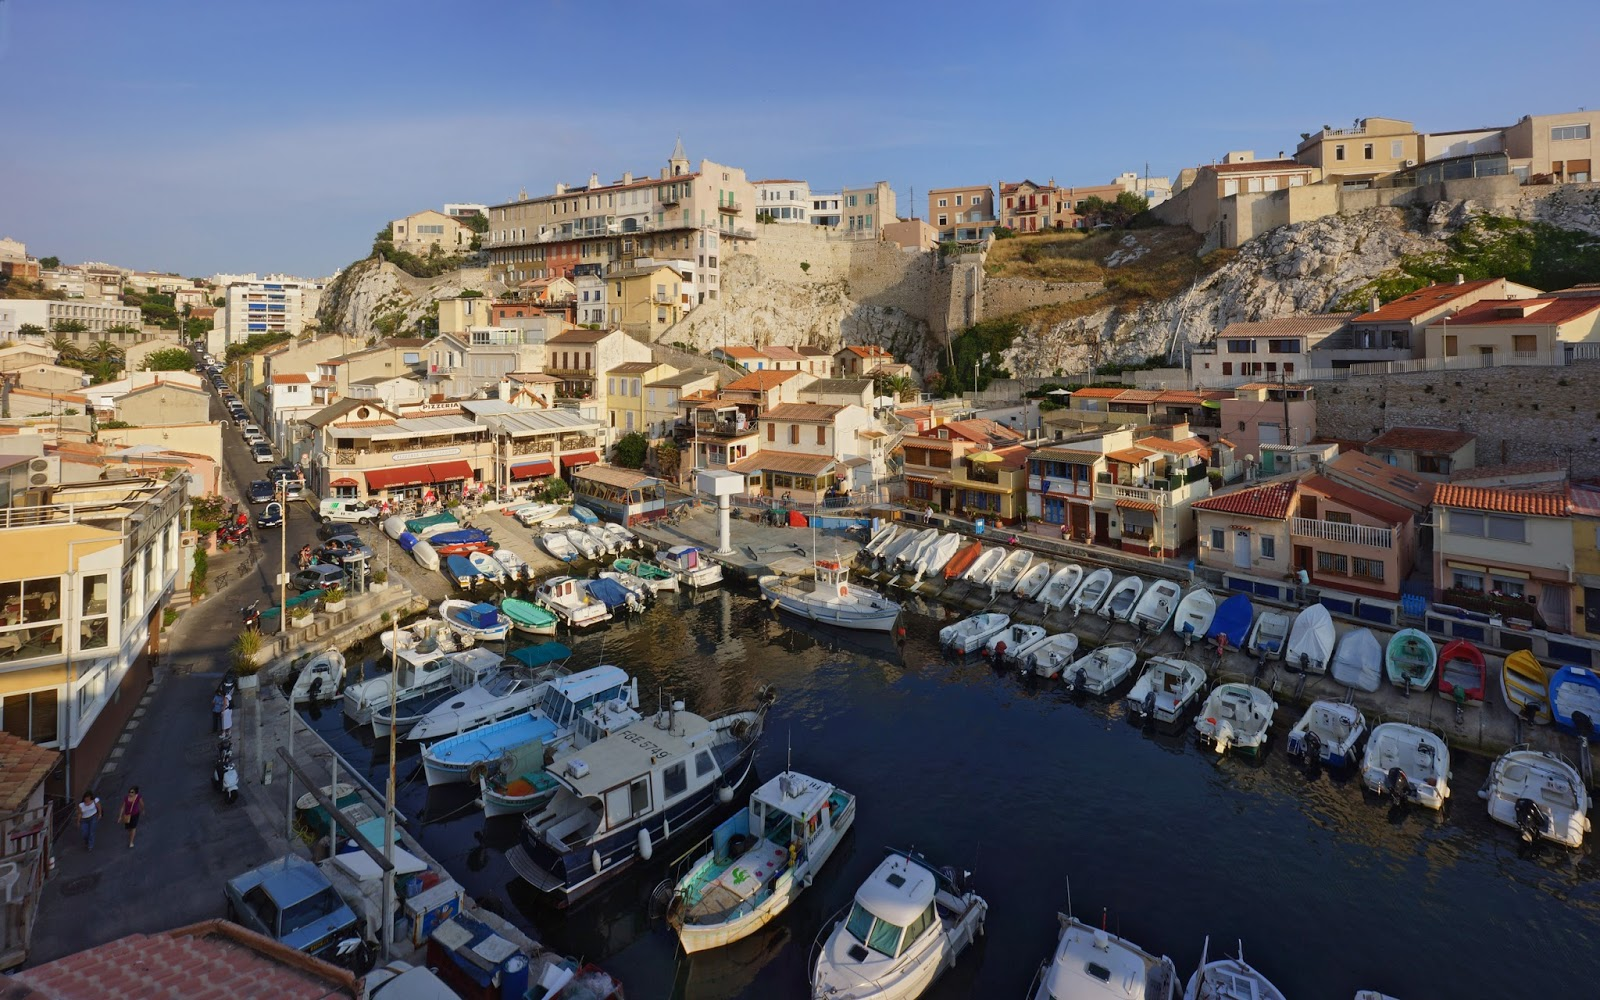 Marsilia, mereu pitoreasca